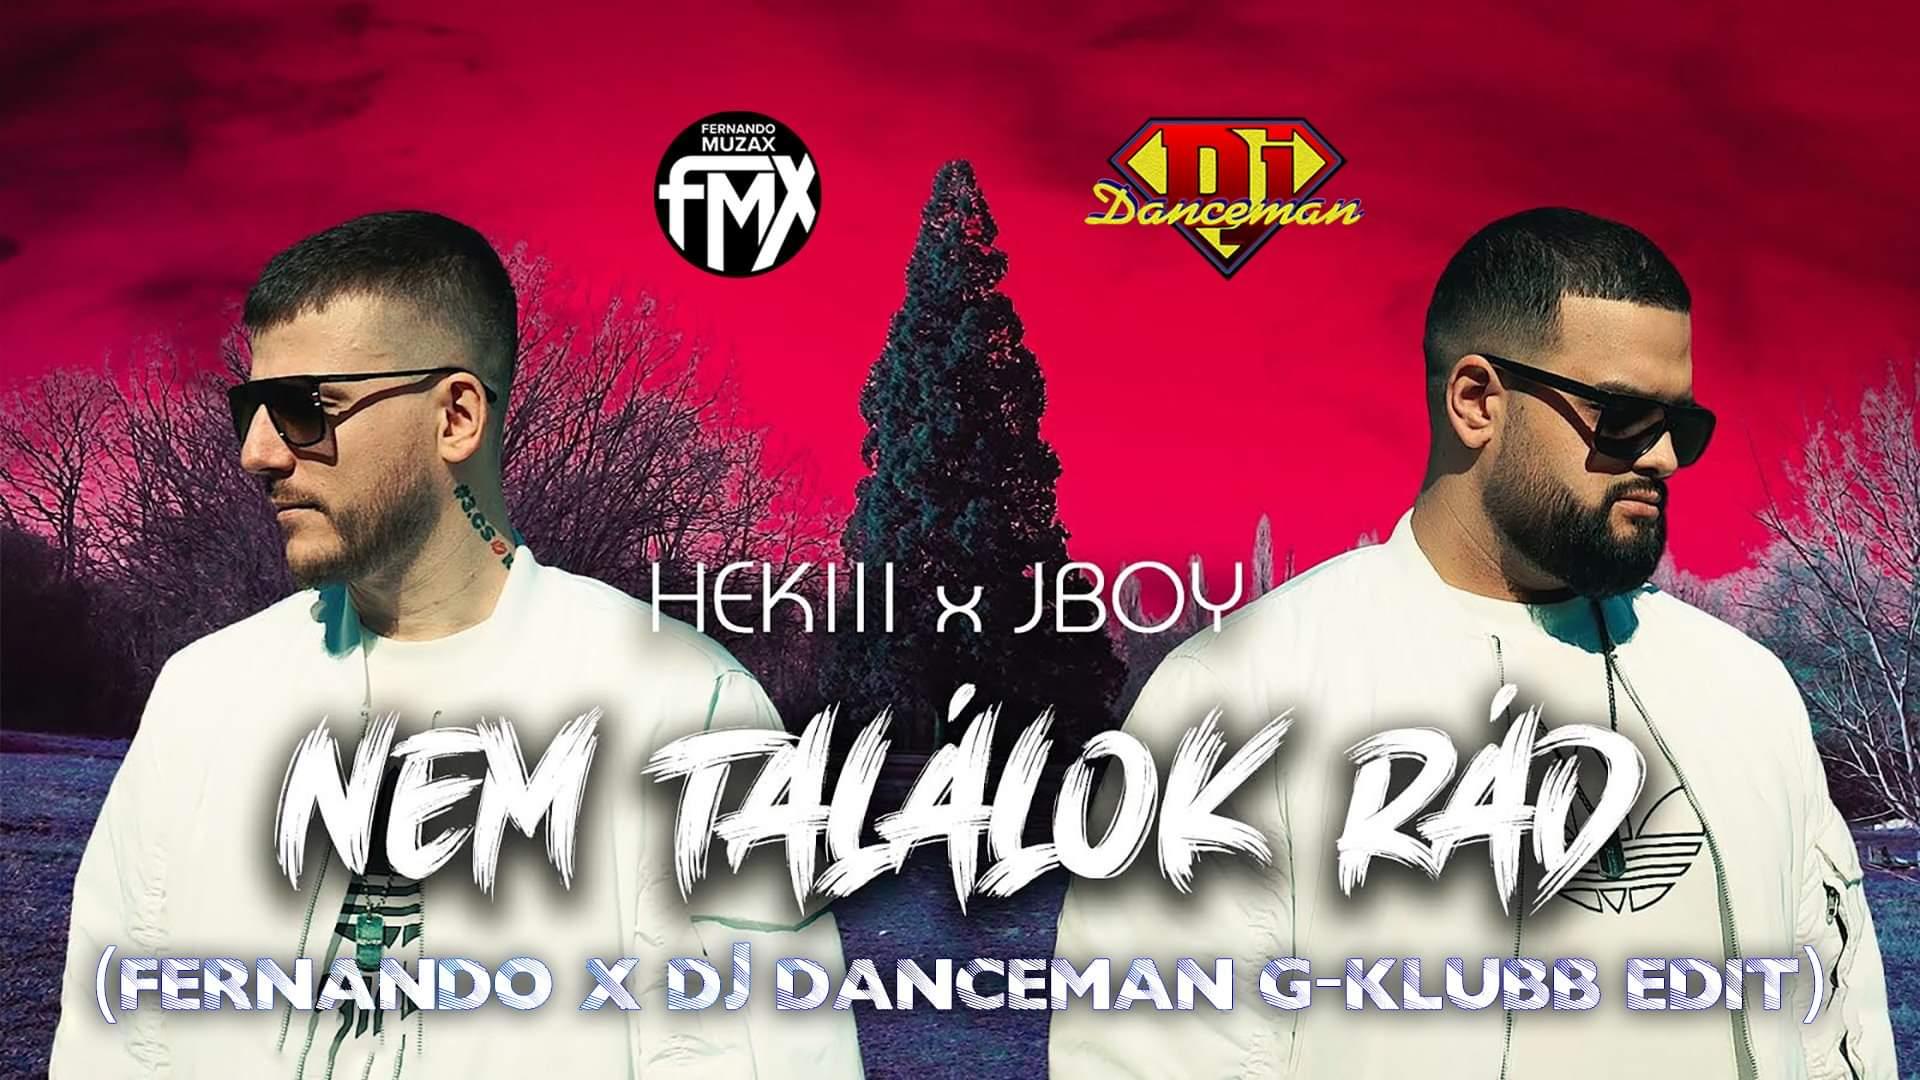 Hekiii x JBoy - Nem találok rád (Fernando x Dj Danceman Remix)